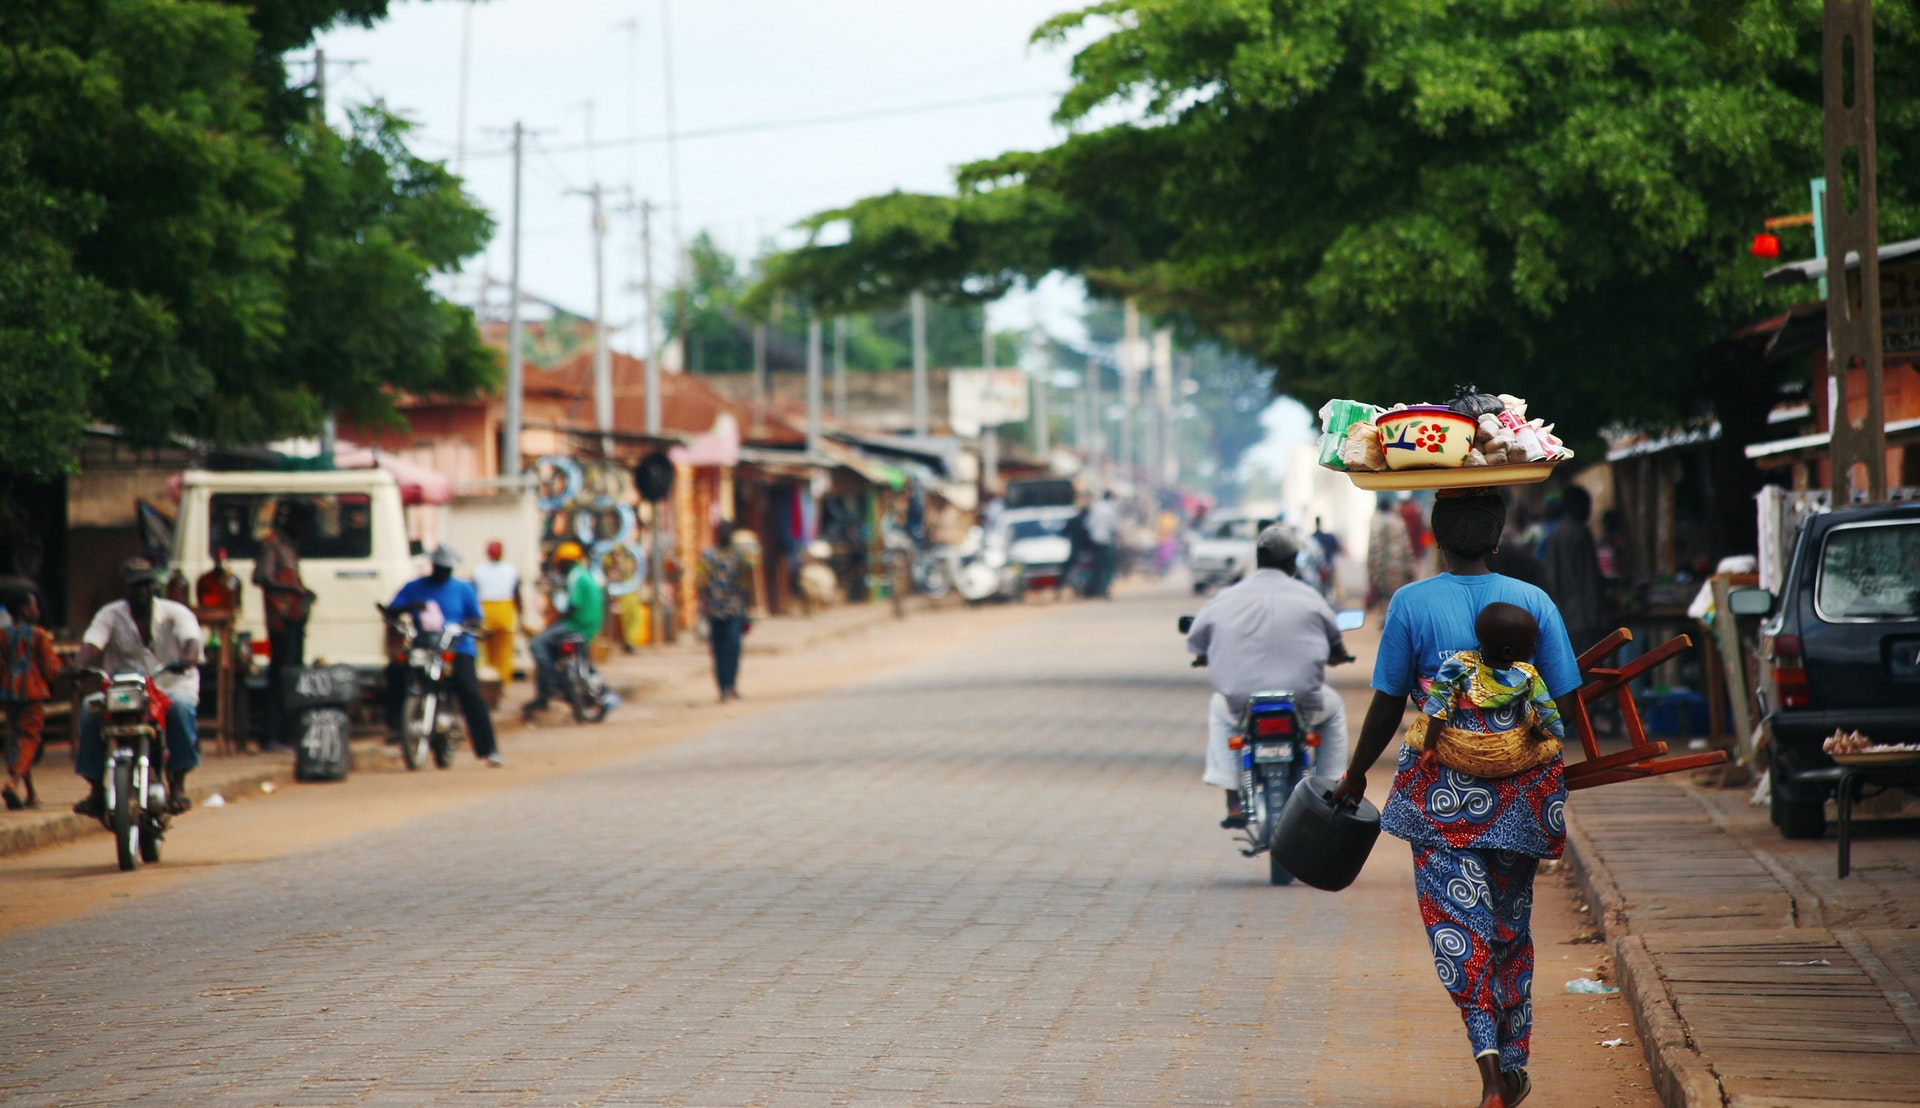 Gater i Afrika © peeterv, Getty Images